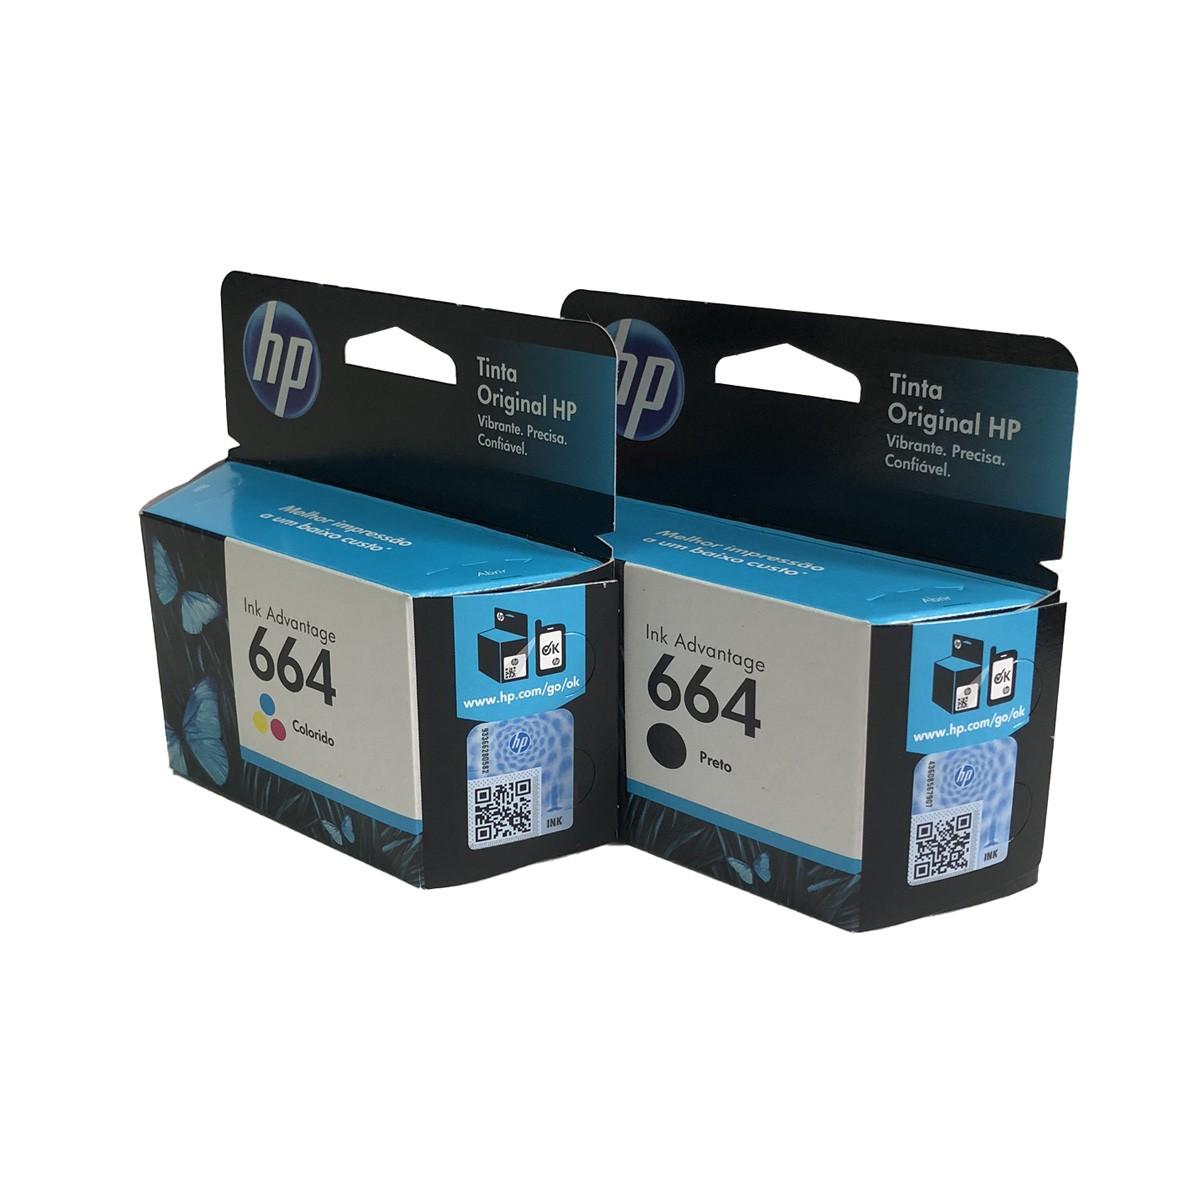 Kit 2 cartucho HP 664 Preto e Colorido para 1115 2136 3636 3836 4536 4676